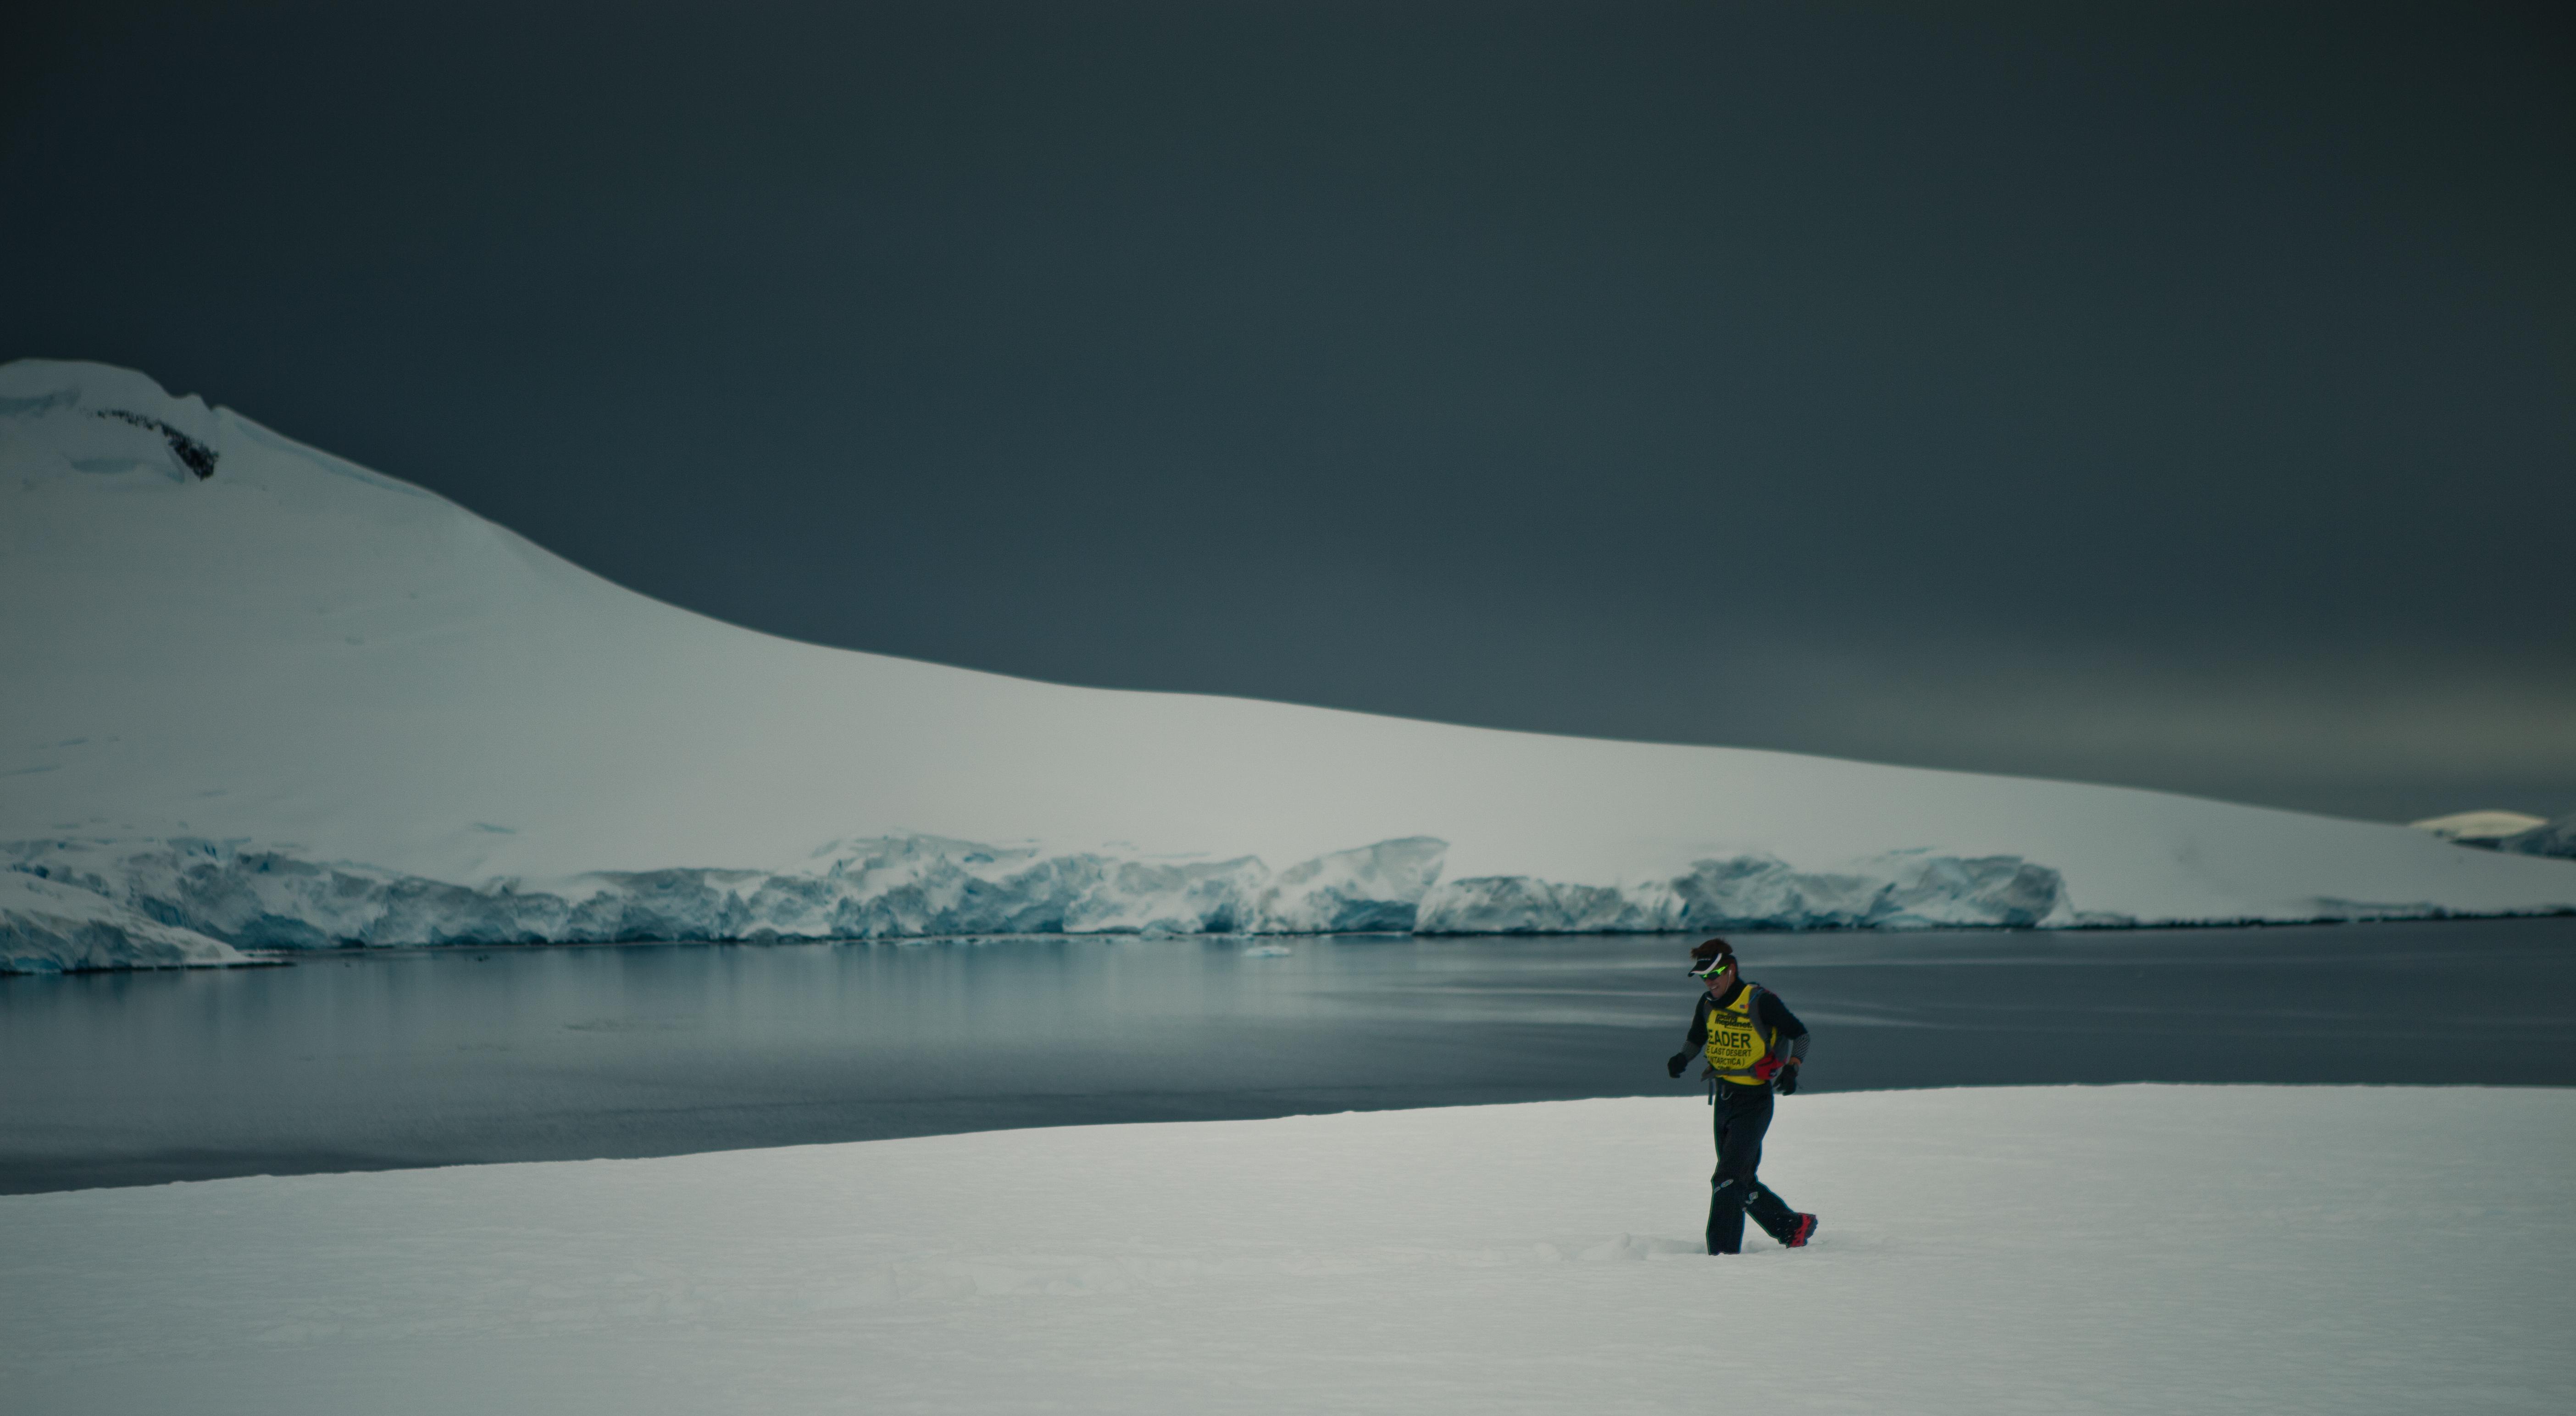 Ryan Sandes | Antarctica